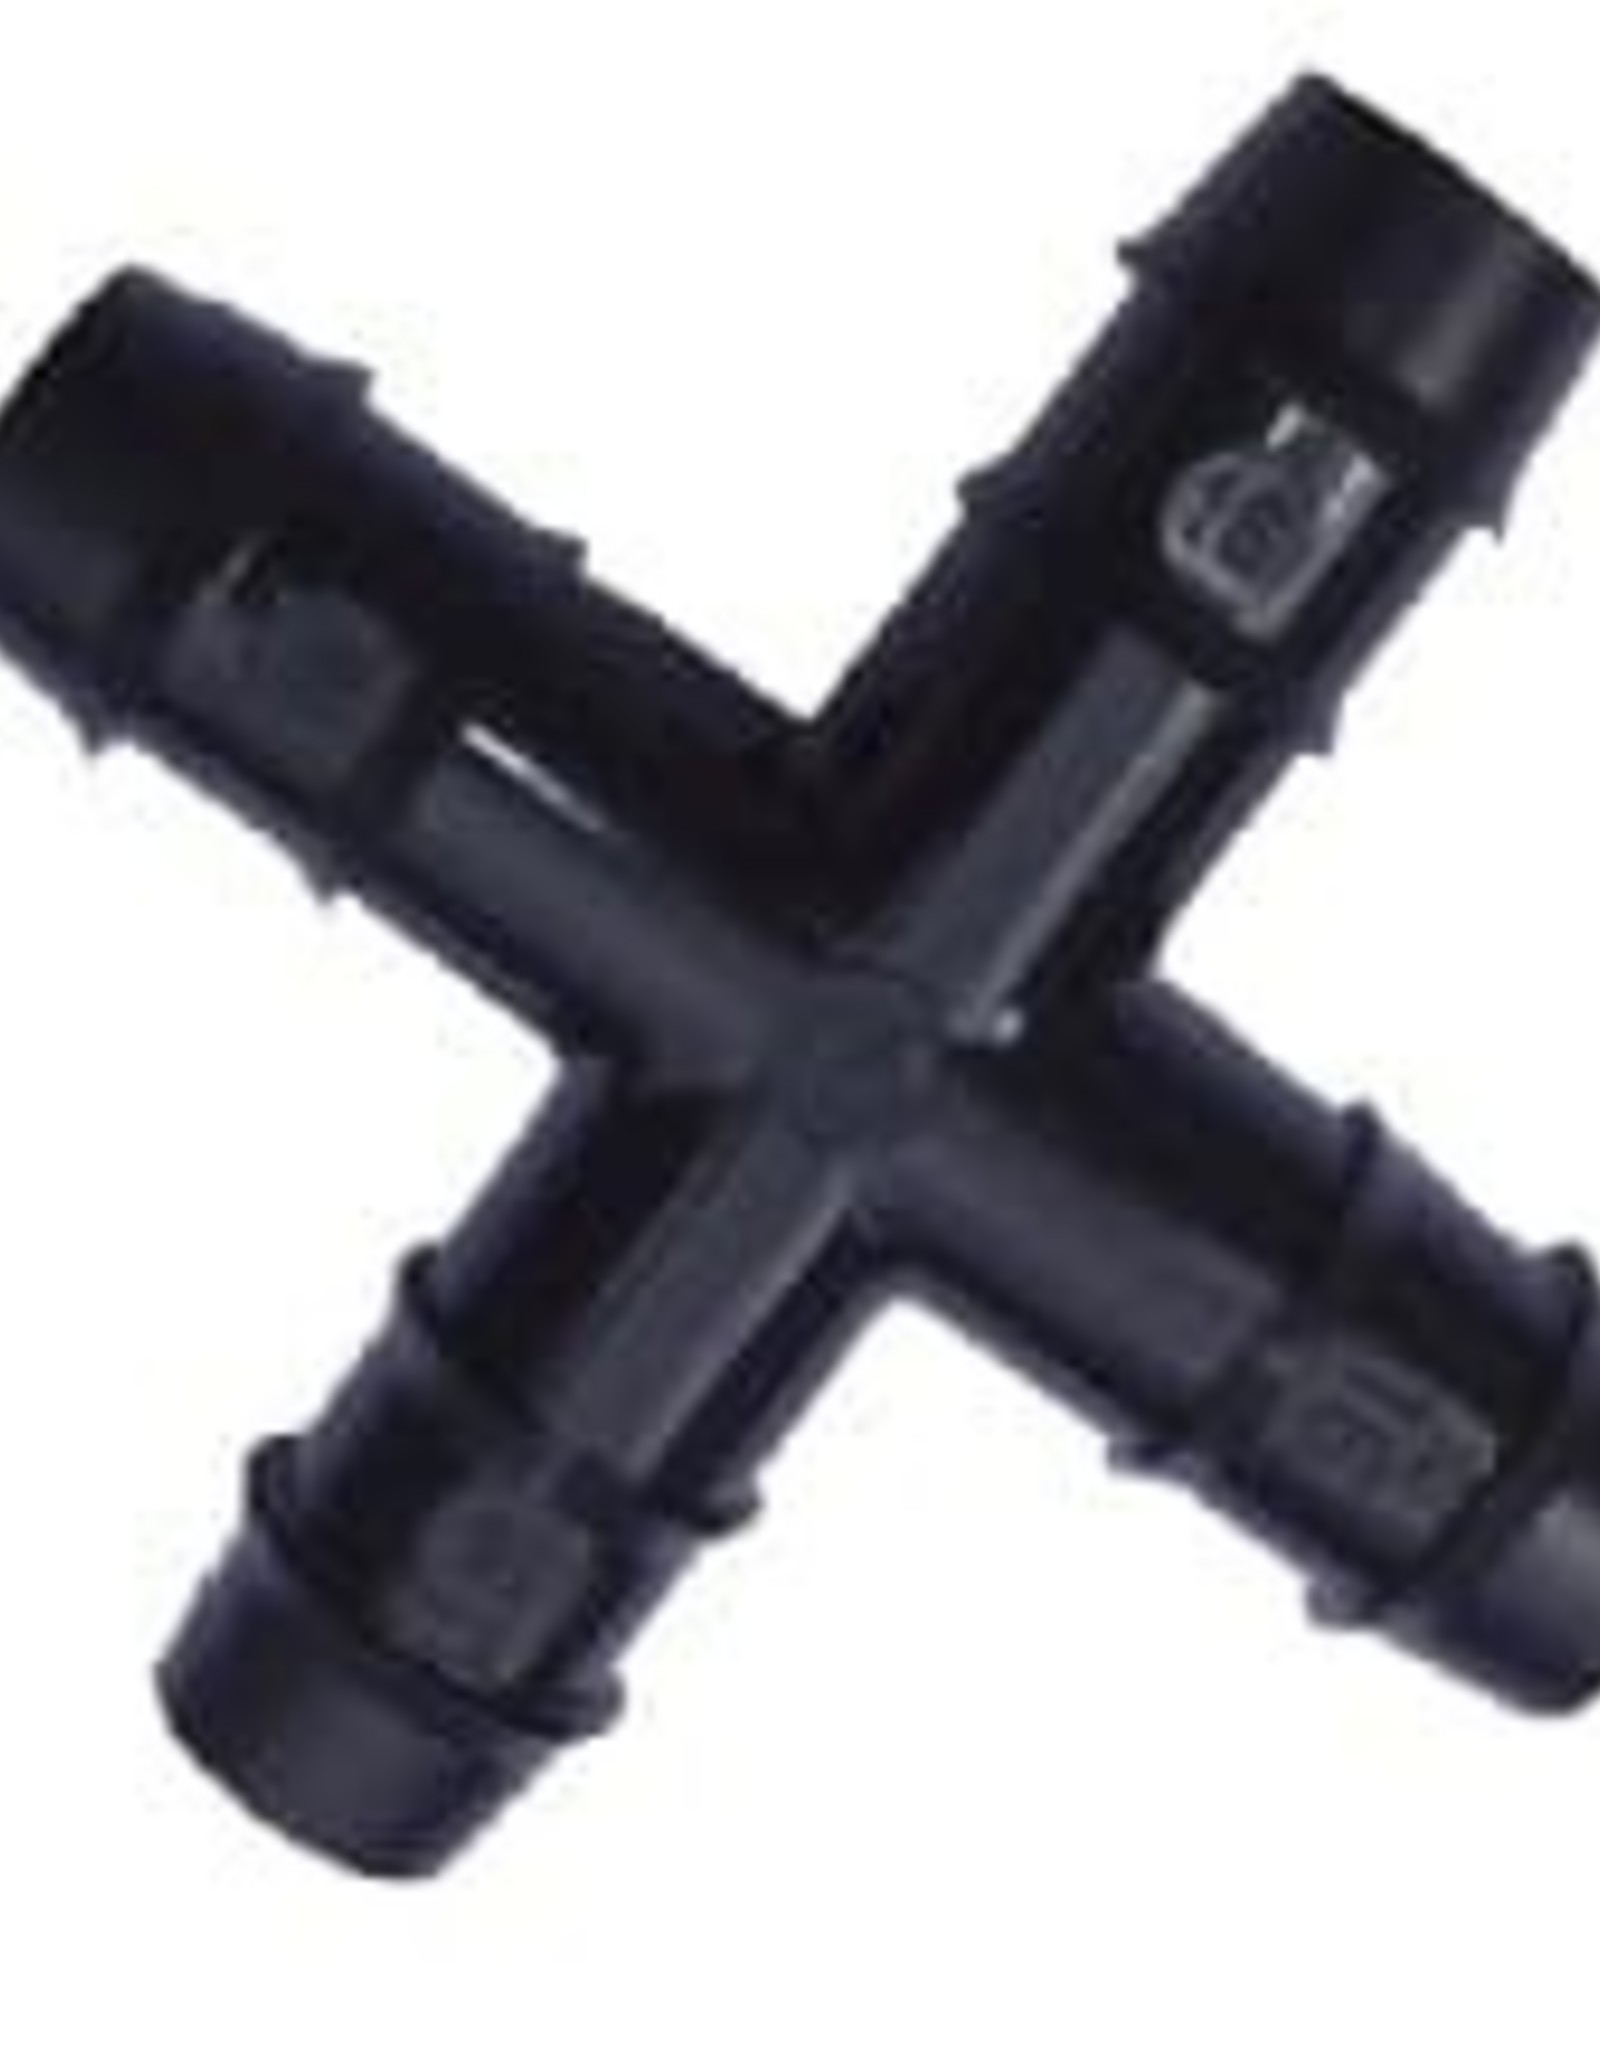 Autopot 16MM Cross Connector